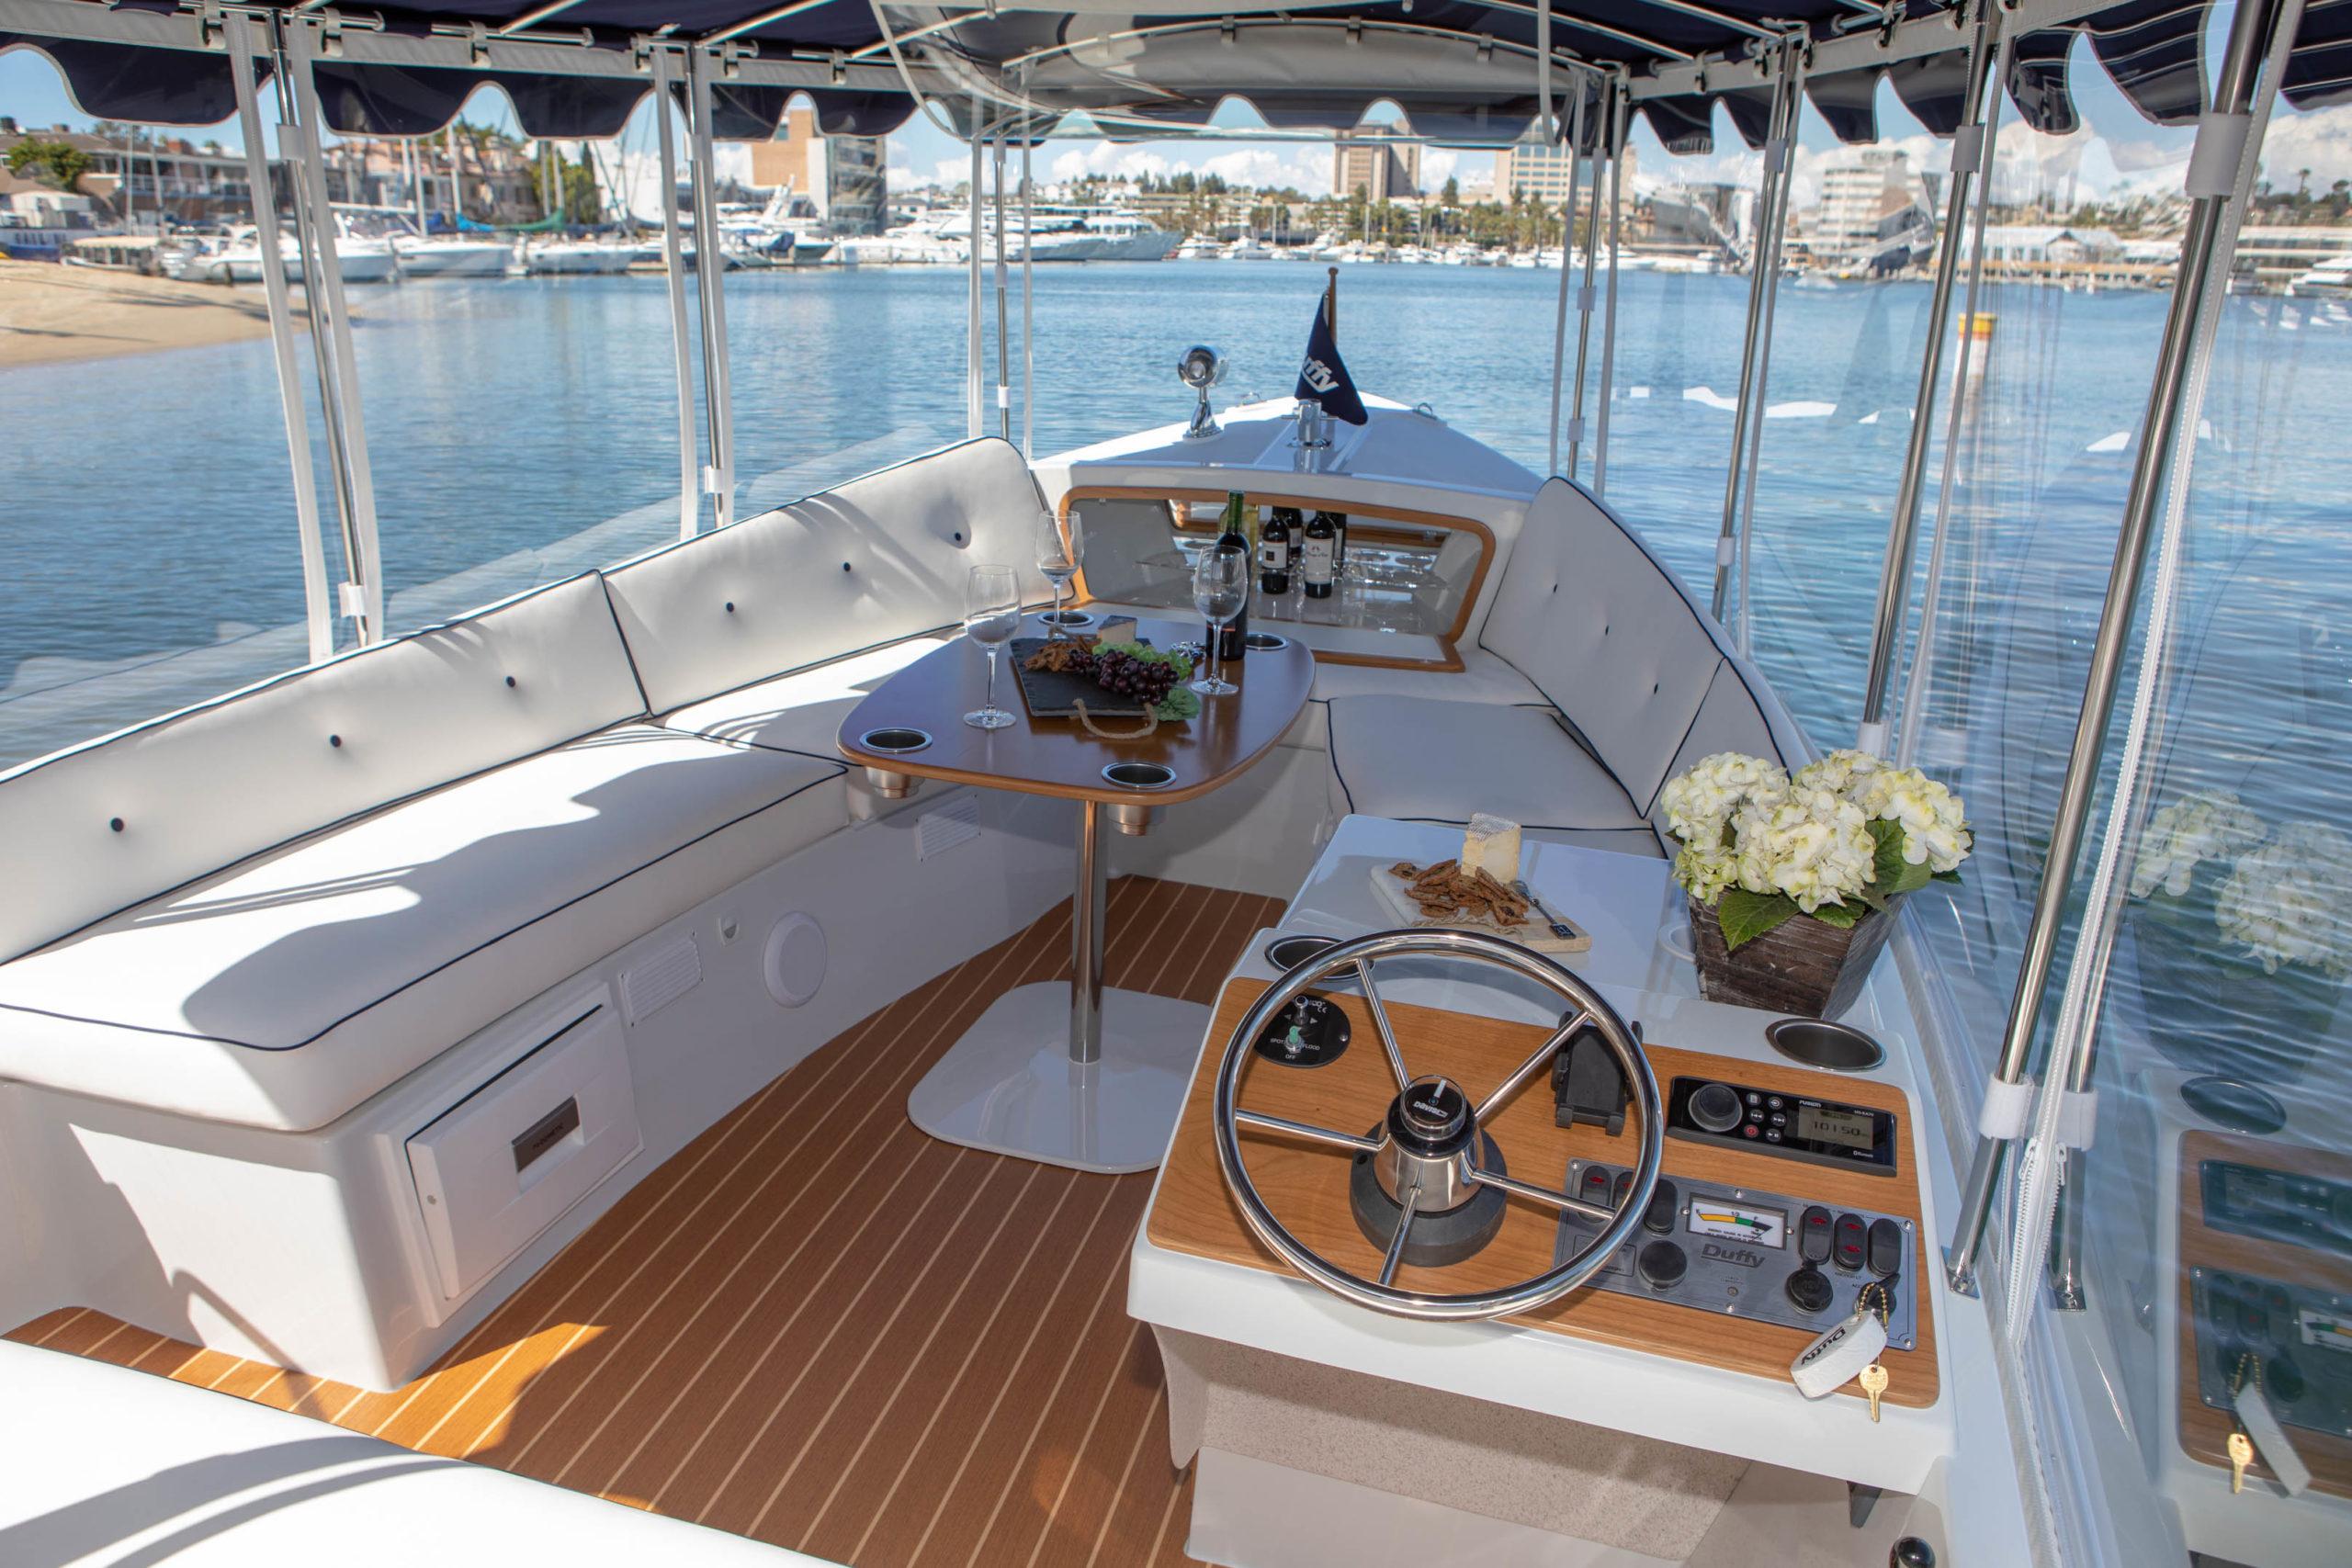 Duffy-Electric-Boats-22-Sun-Cruiser-Interior-2020-11